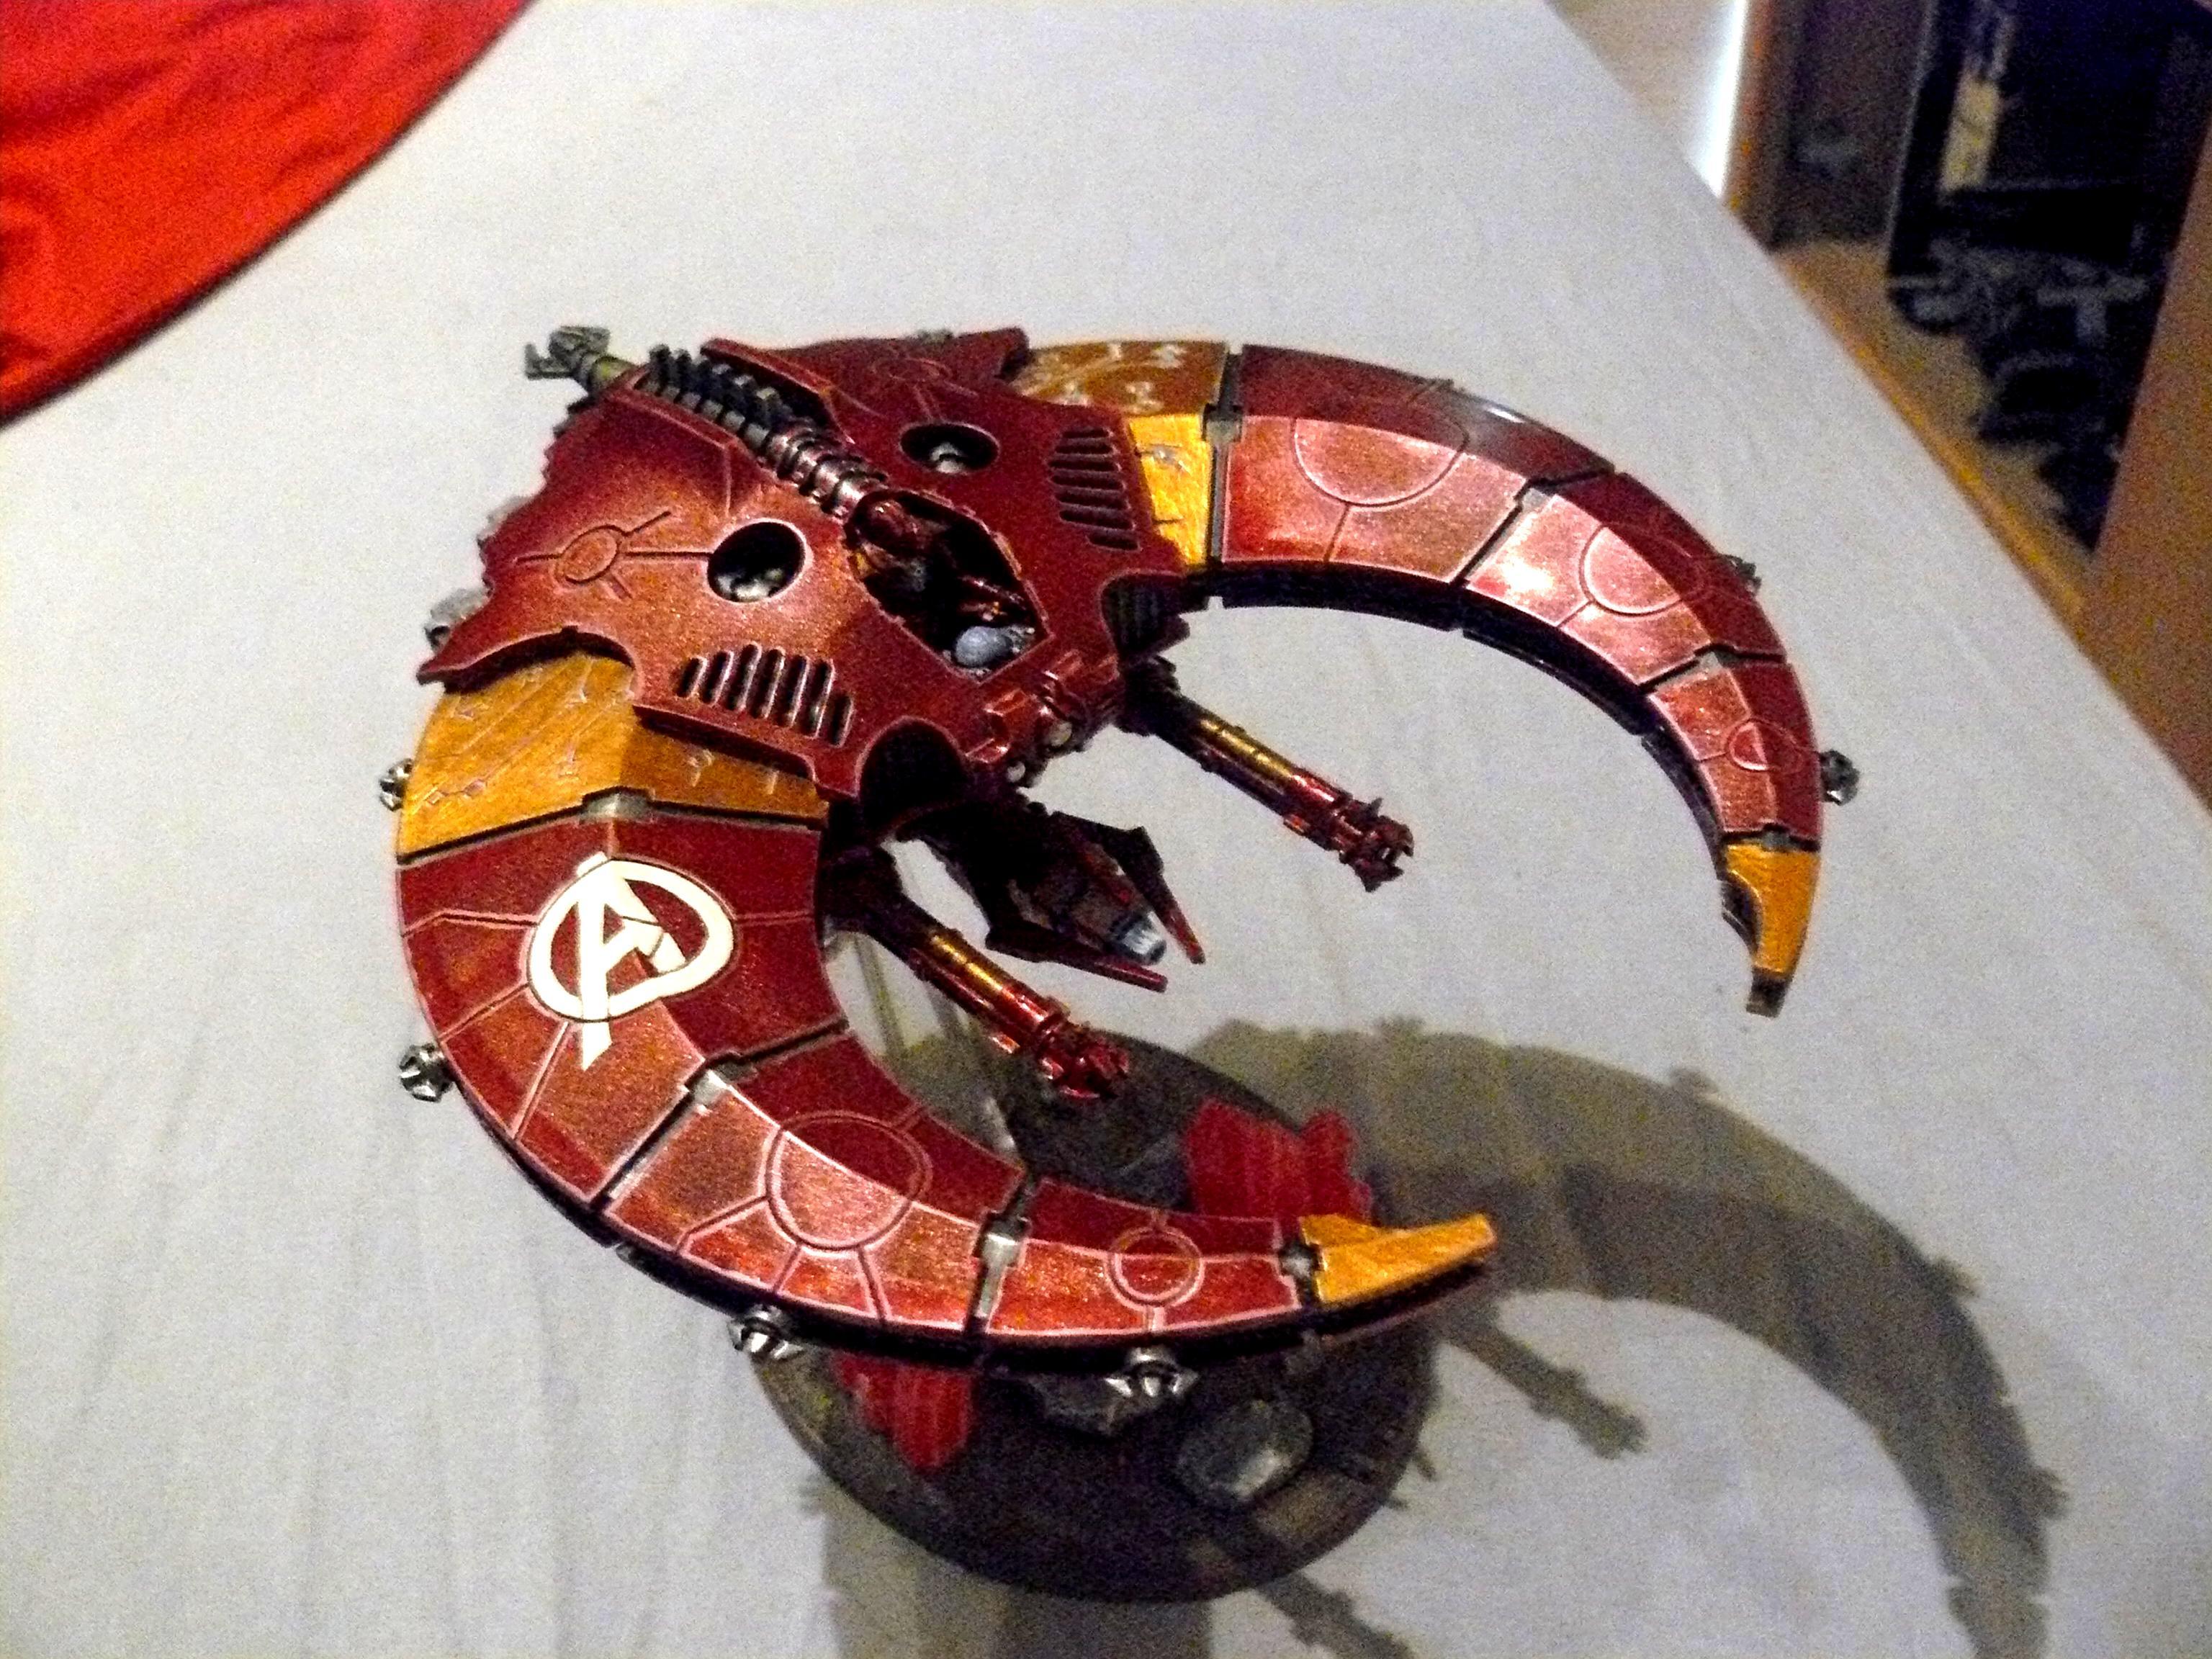 Avengers, Doom Scythe, Flyer, Iron Crons, Necrons